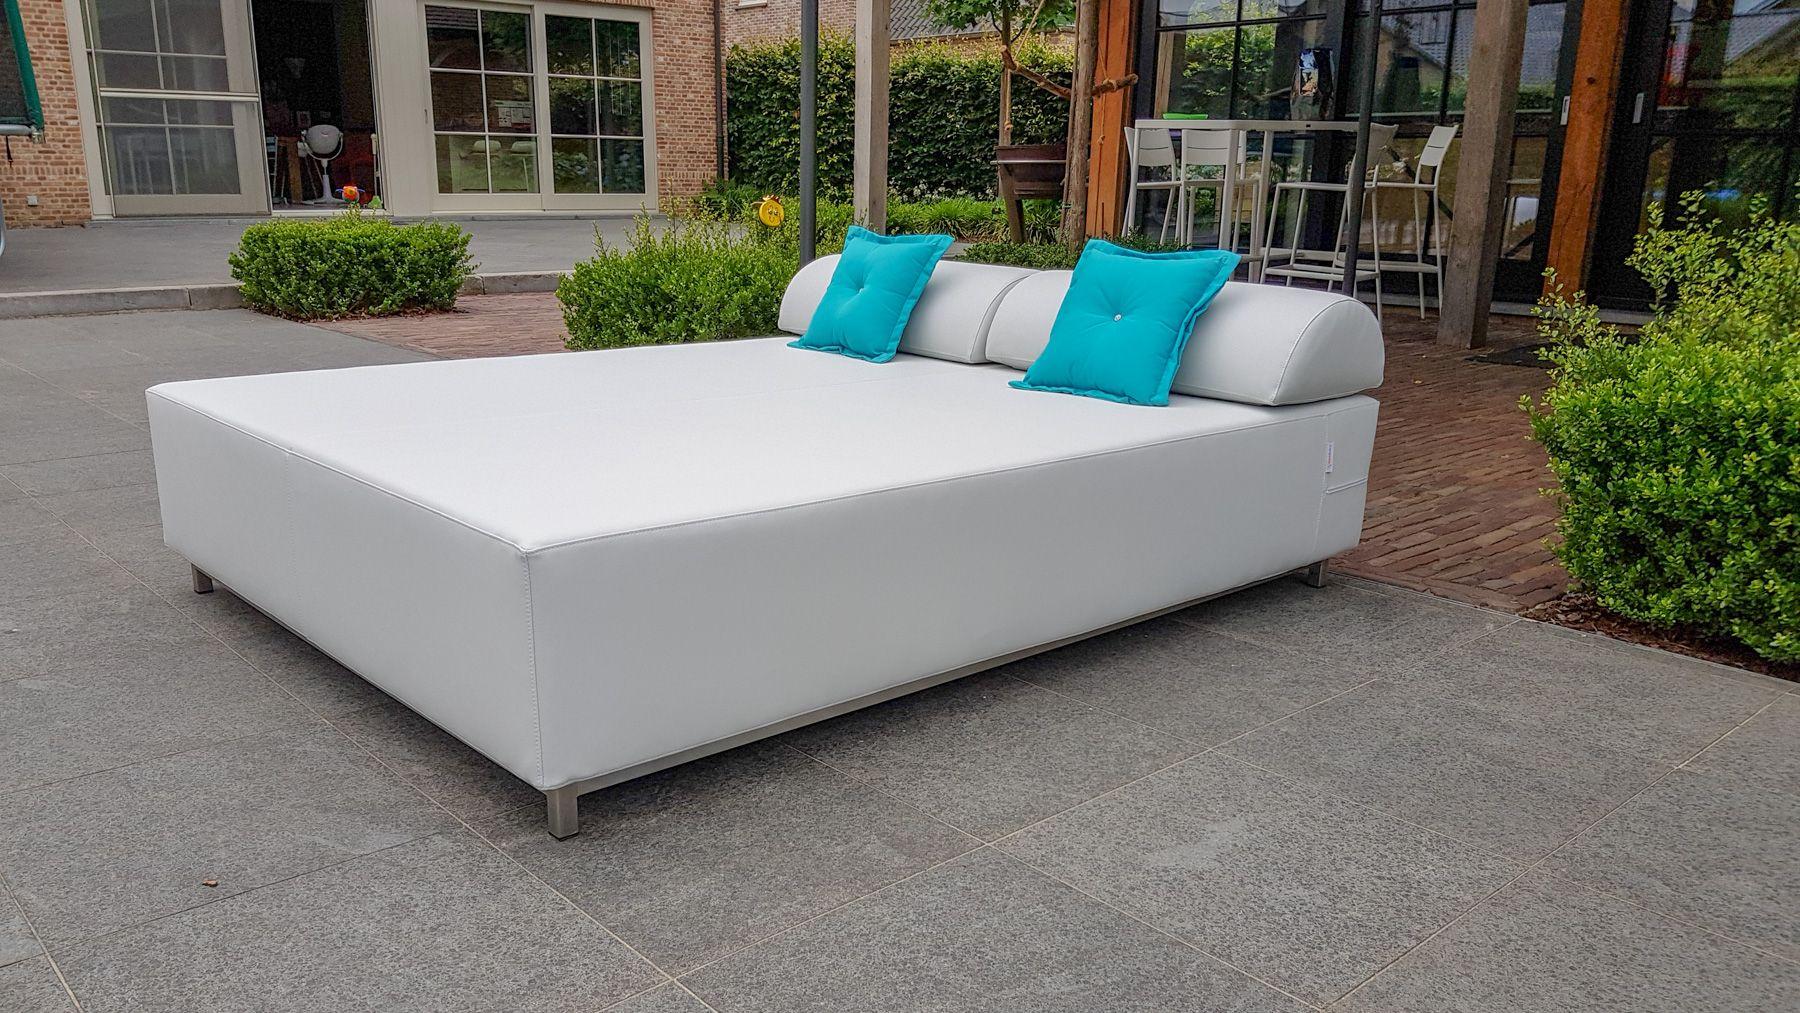 Loungebed op binnenplaats